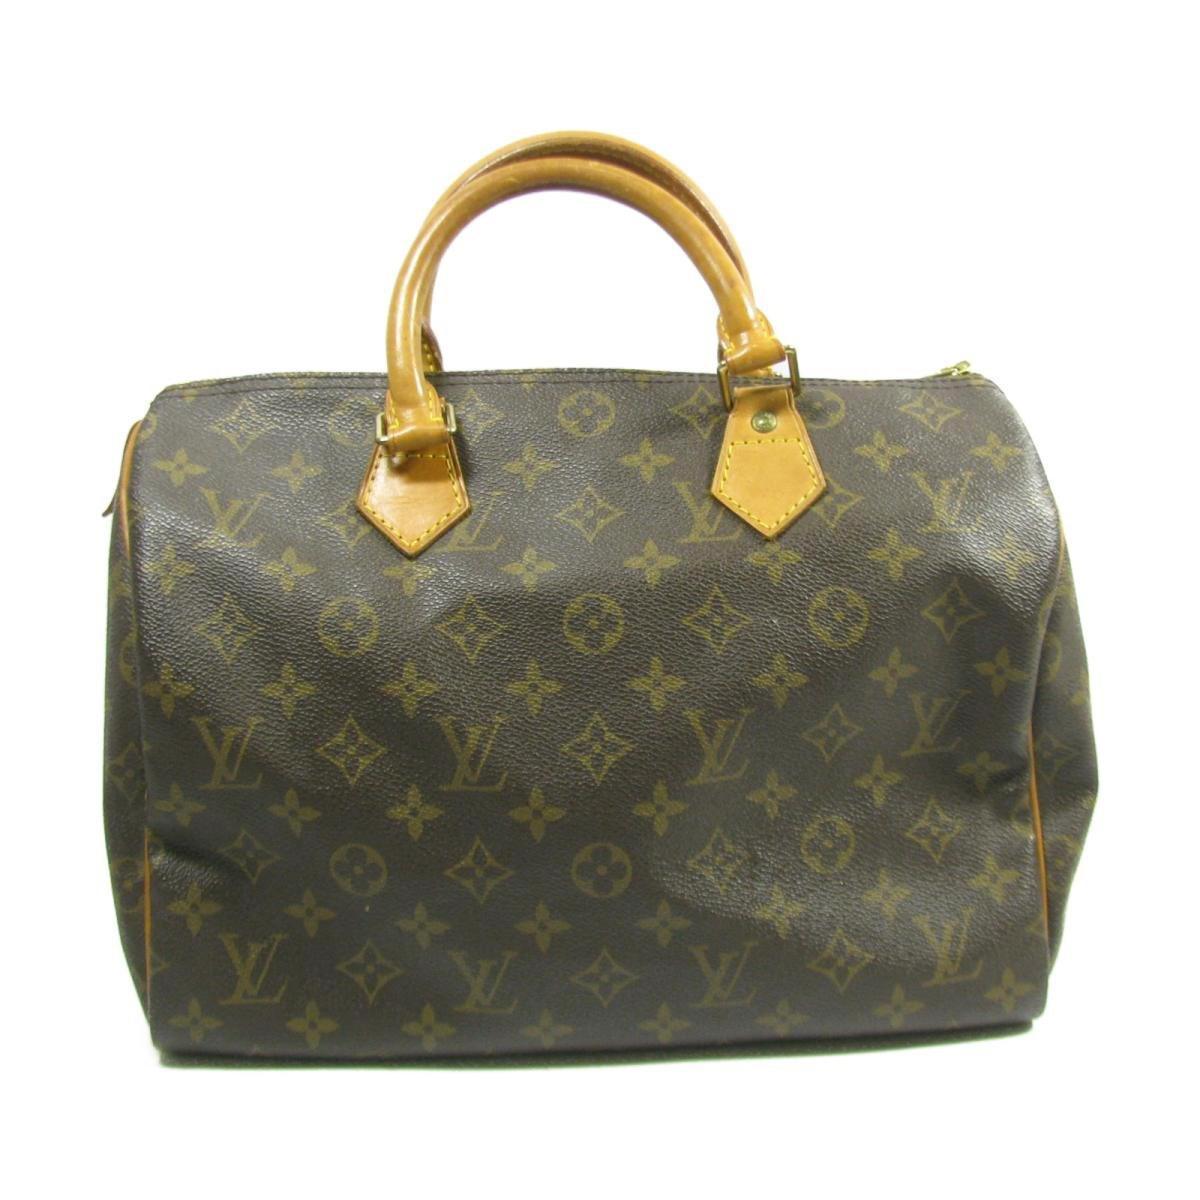 2f6efd08ca5 Lyst - Louis Vuitton Authentic Speedy 30 Handbag Boston Bag M41526 ...